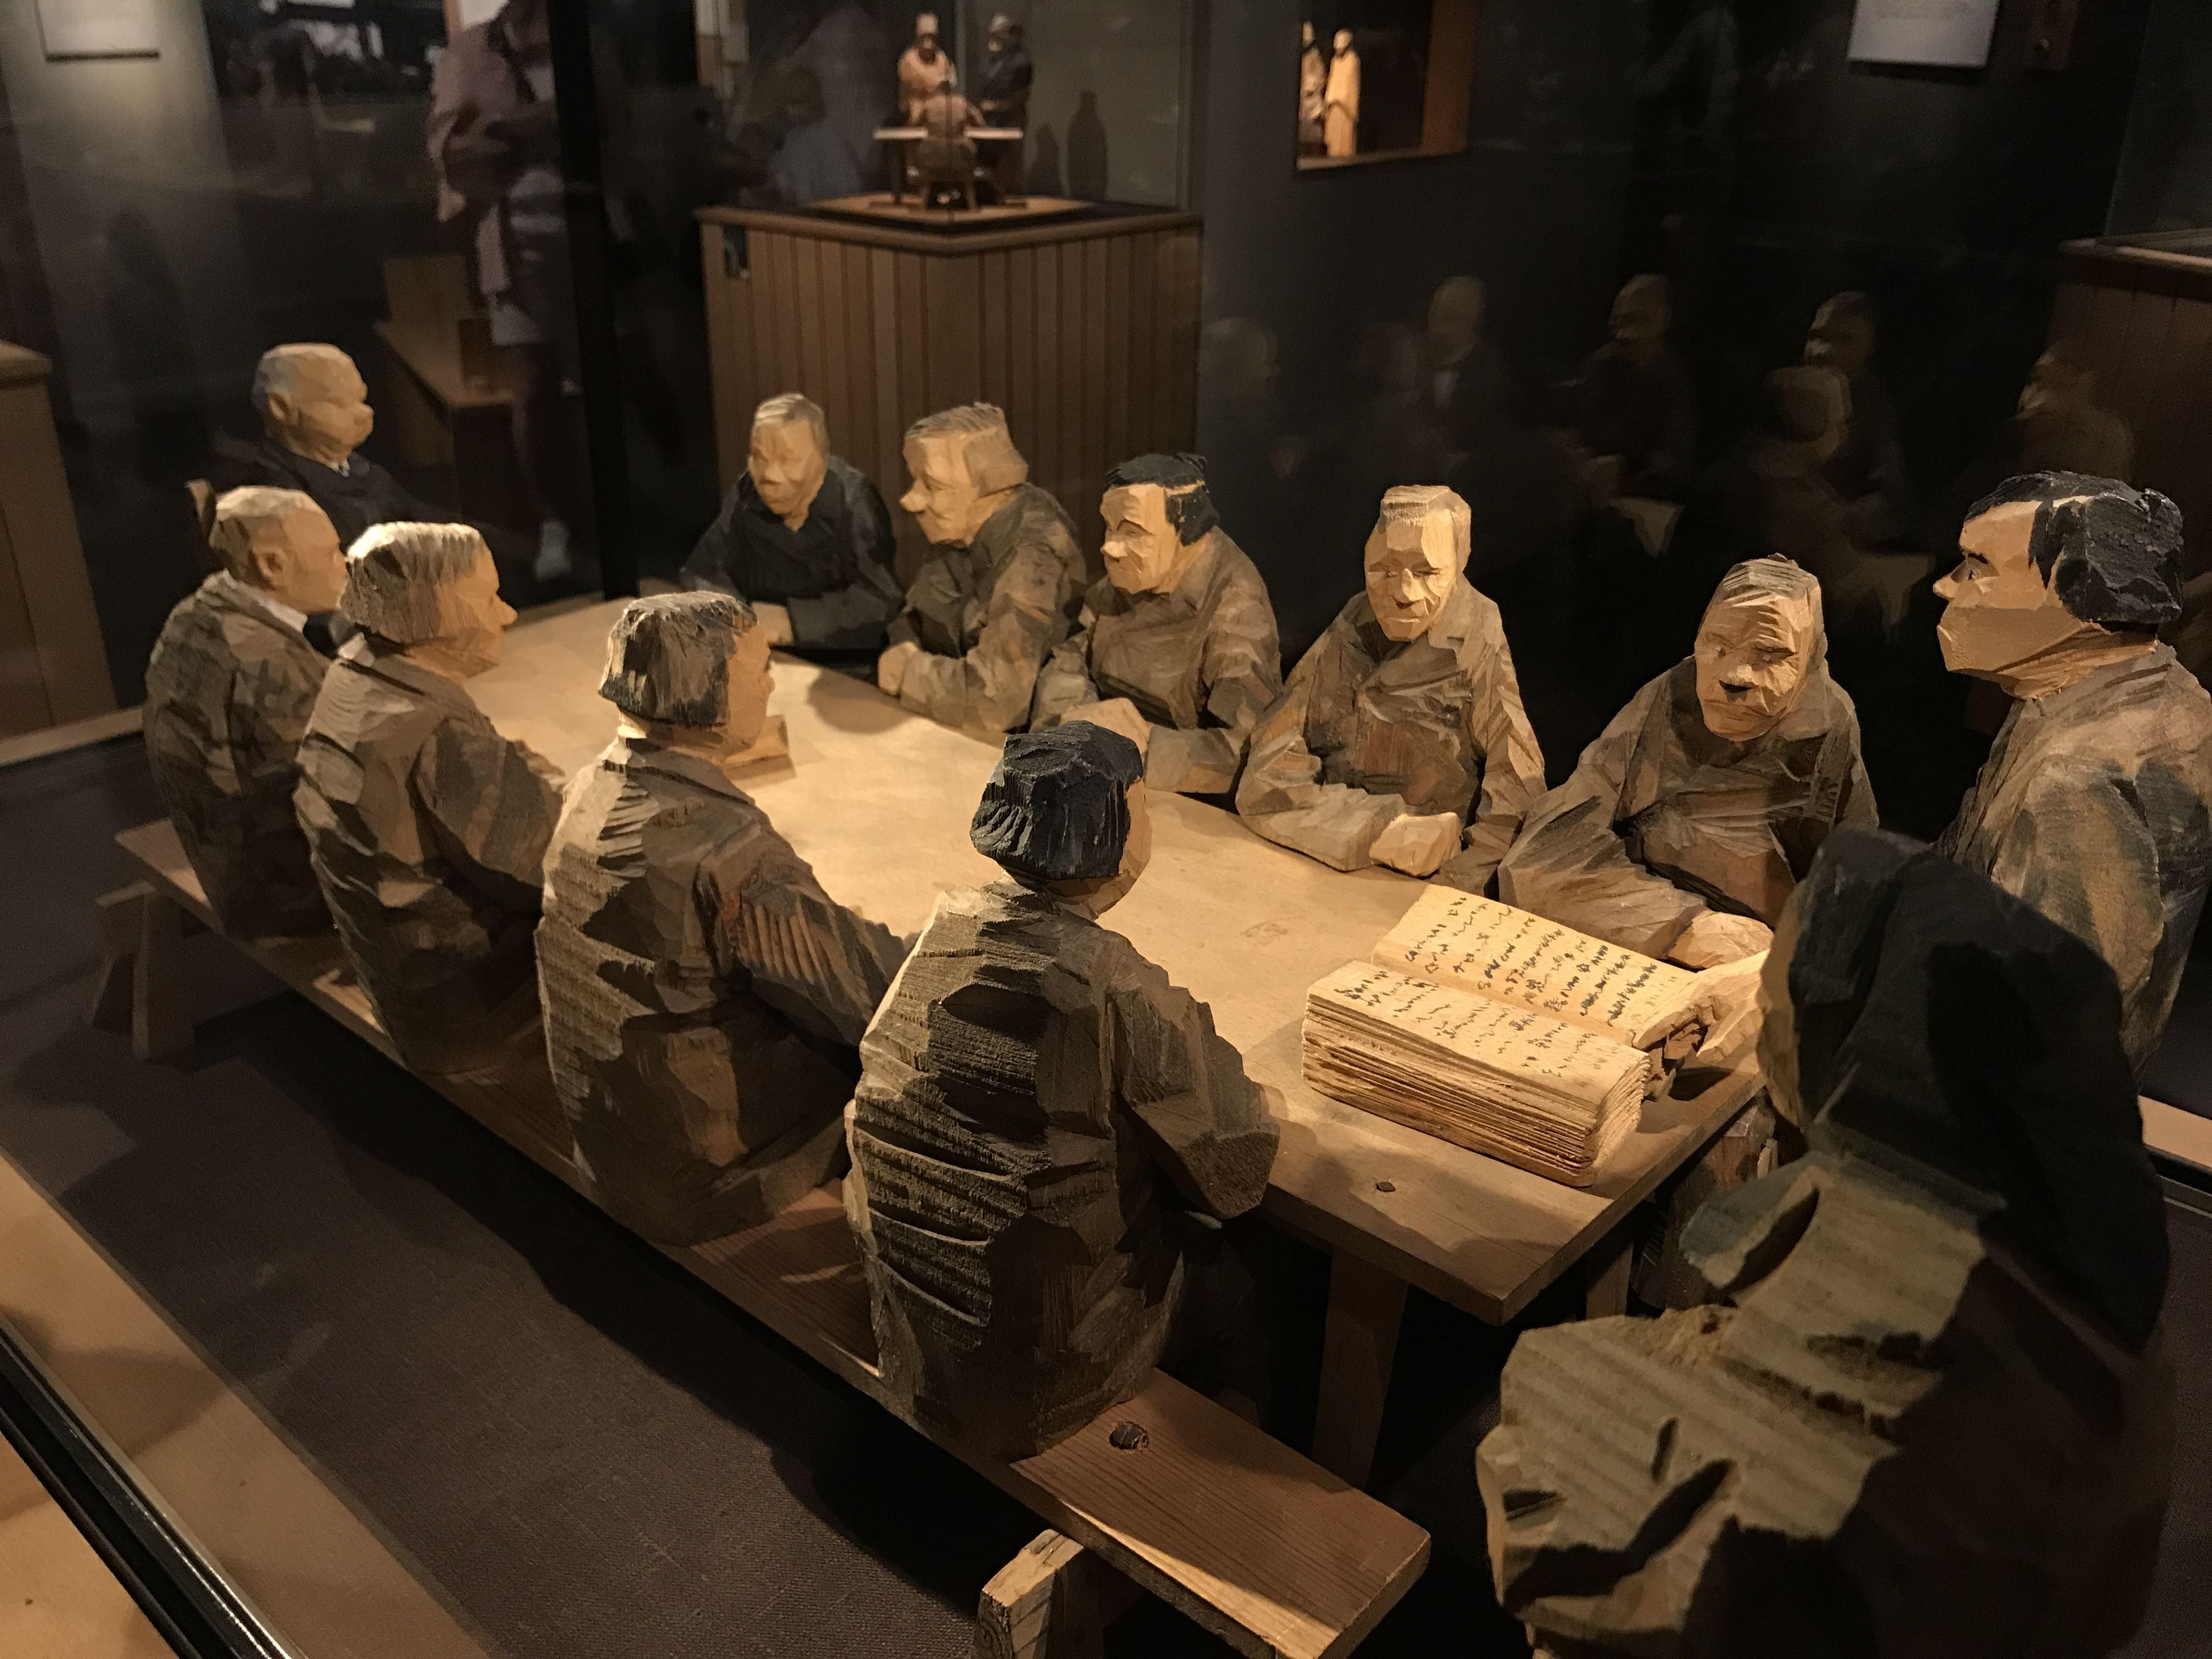 Döderhultarmuseet